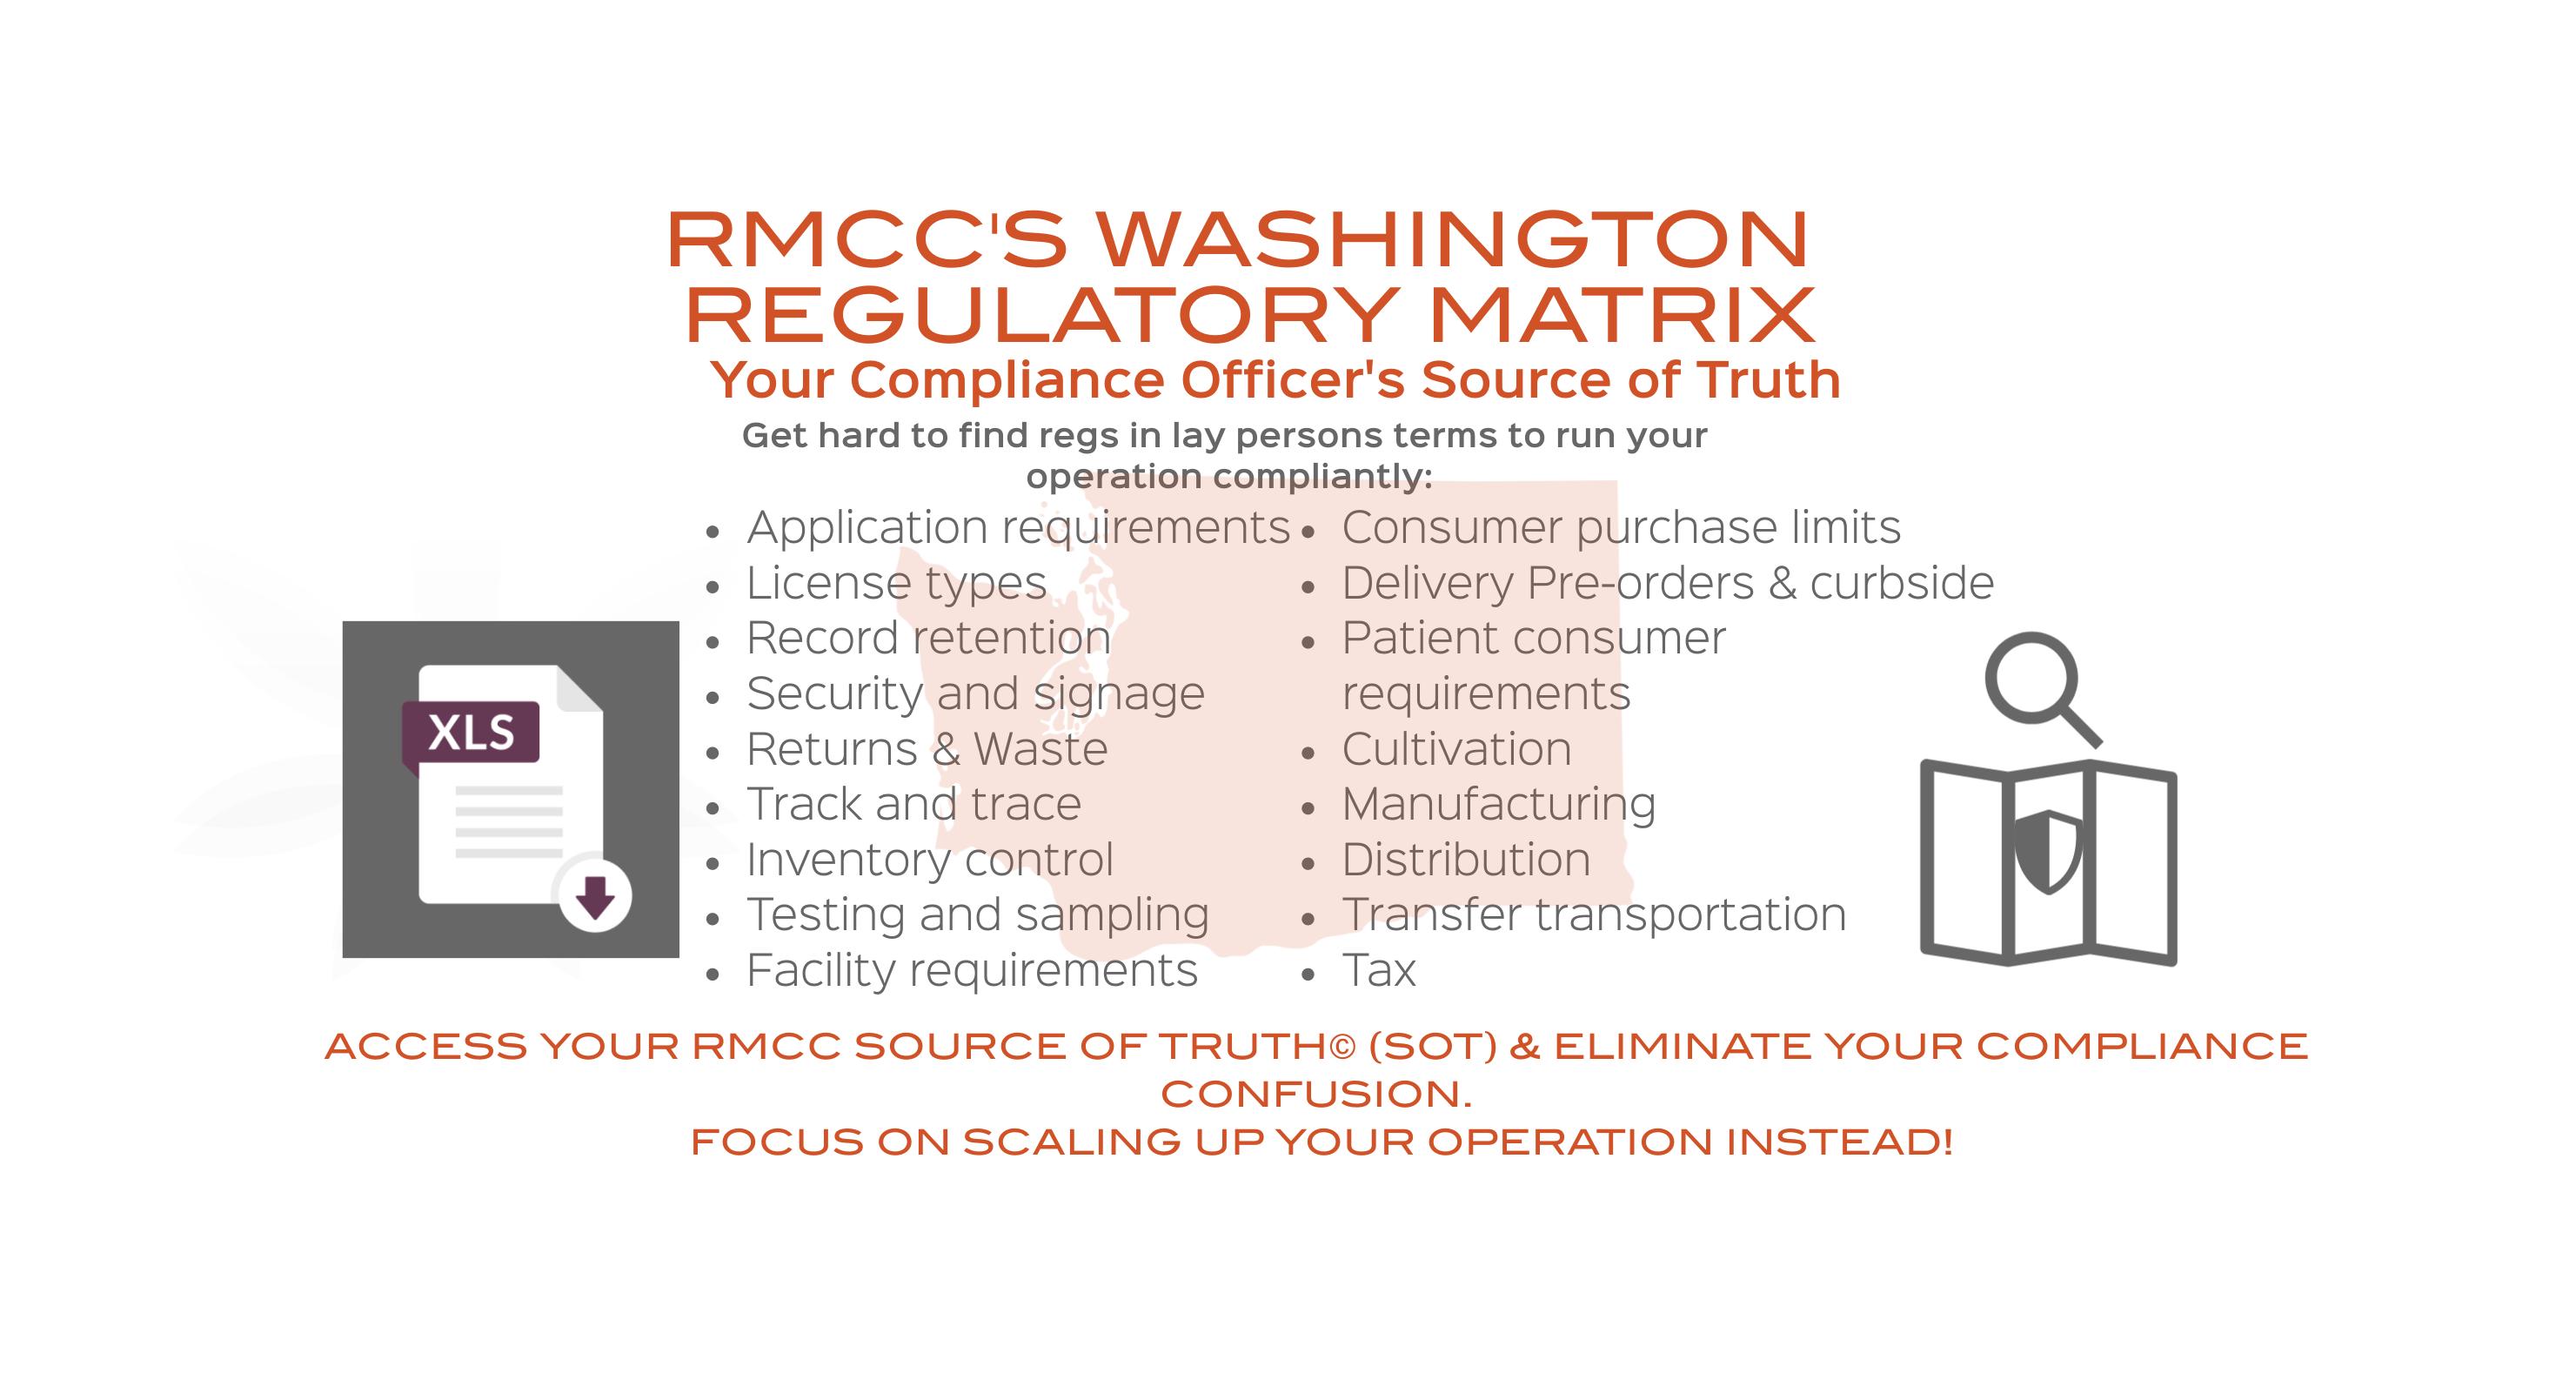 RMCC Washington Cannabis Regulatory Matrix